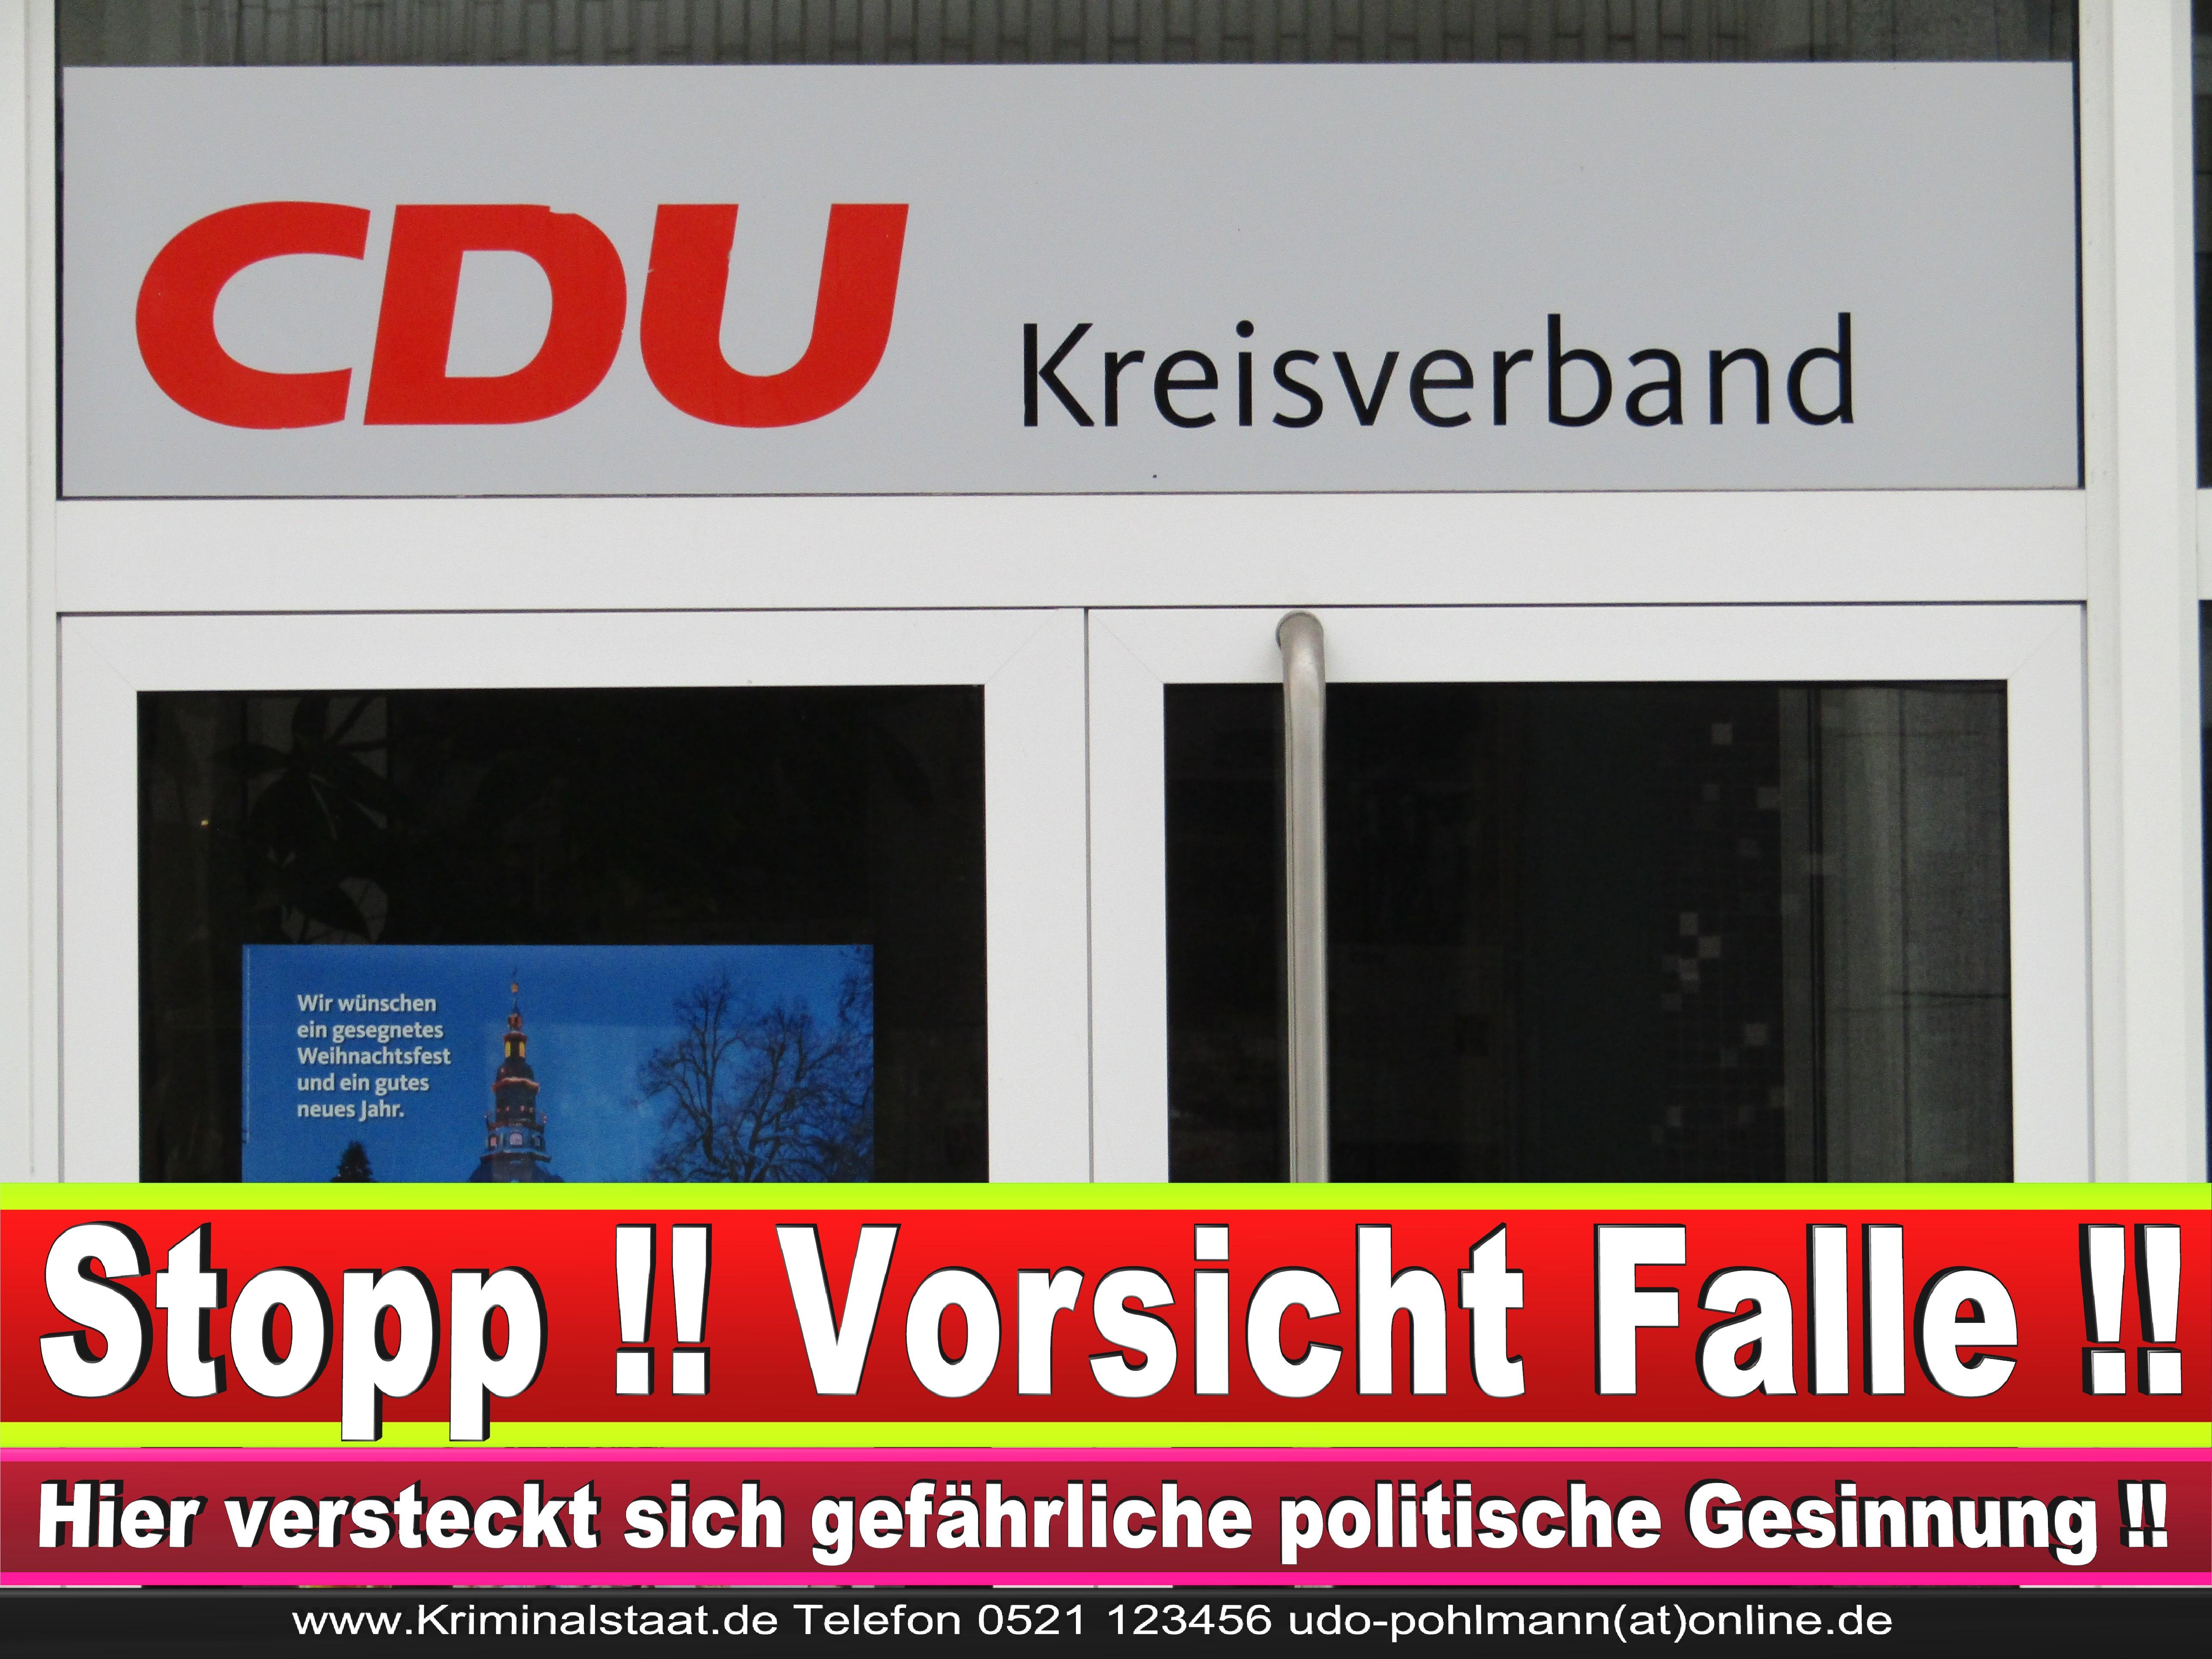 CDU DORTMUND KREISVERBAND BüRGERBüRO CDU FRAKTION ORTSVERBAND CDU NRW GESCHäFTSSTELLE ADRESSE RATSMITGLIEDER CDU (25) 1